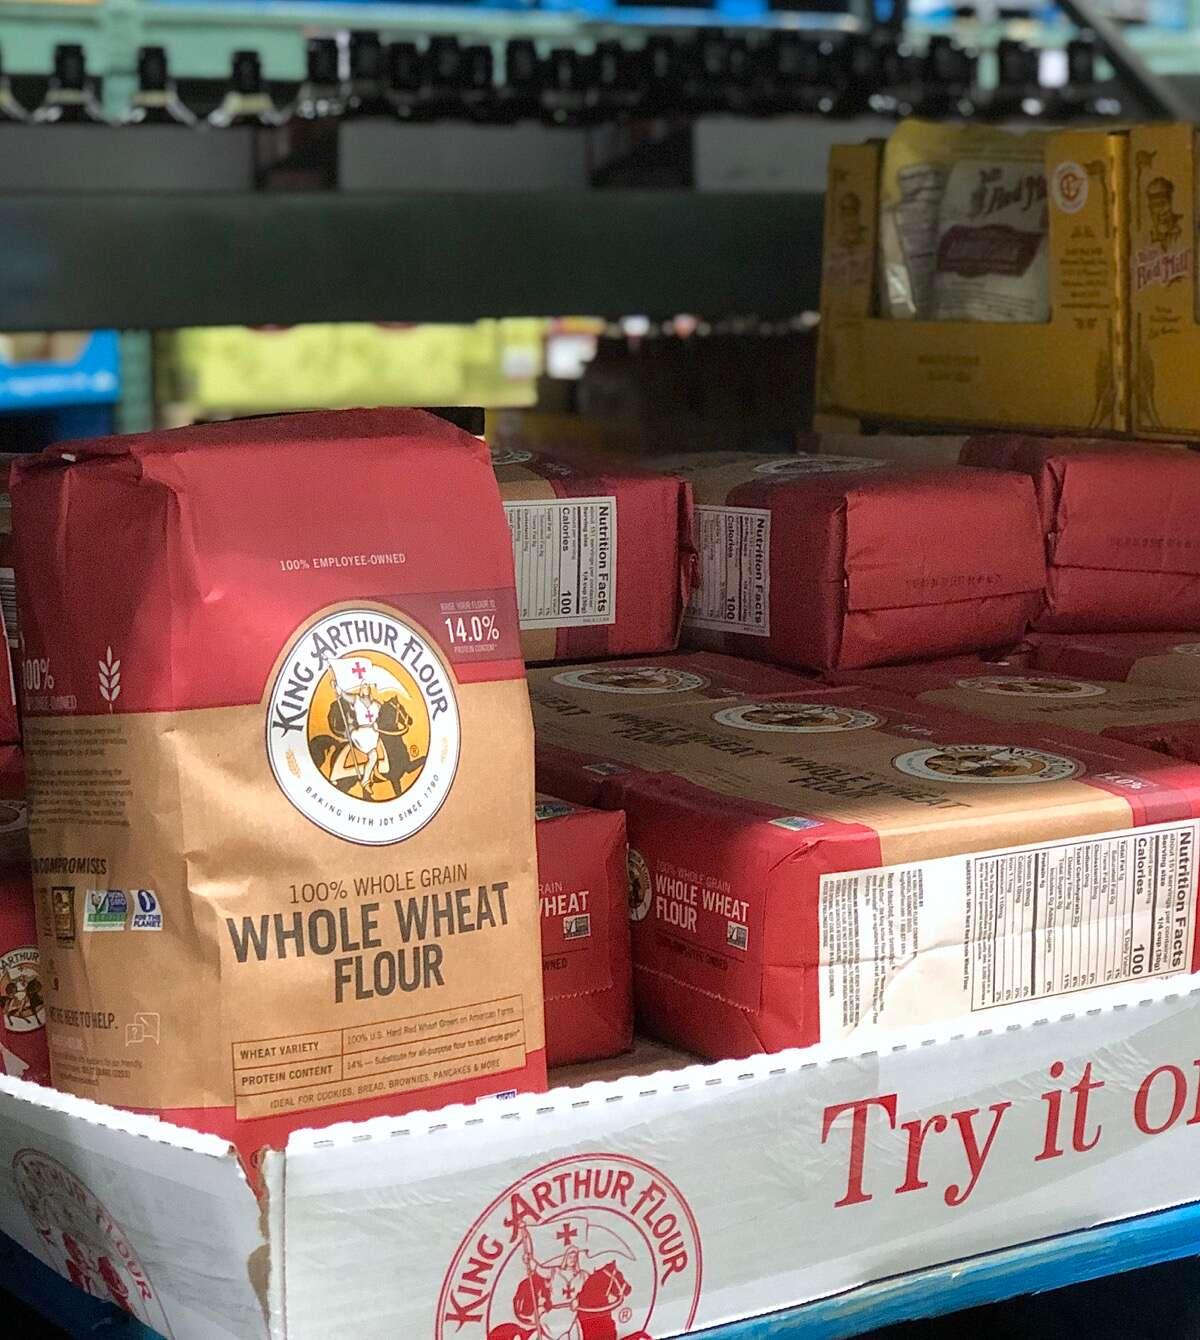 Bag of King Arthur Premium Whole Wheat Flour on the shelf of a warehouse store.